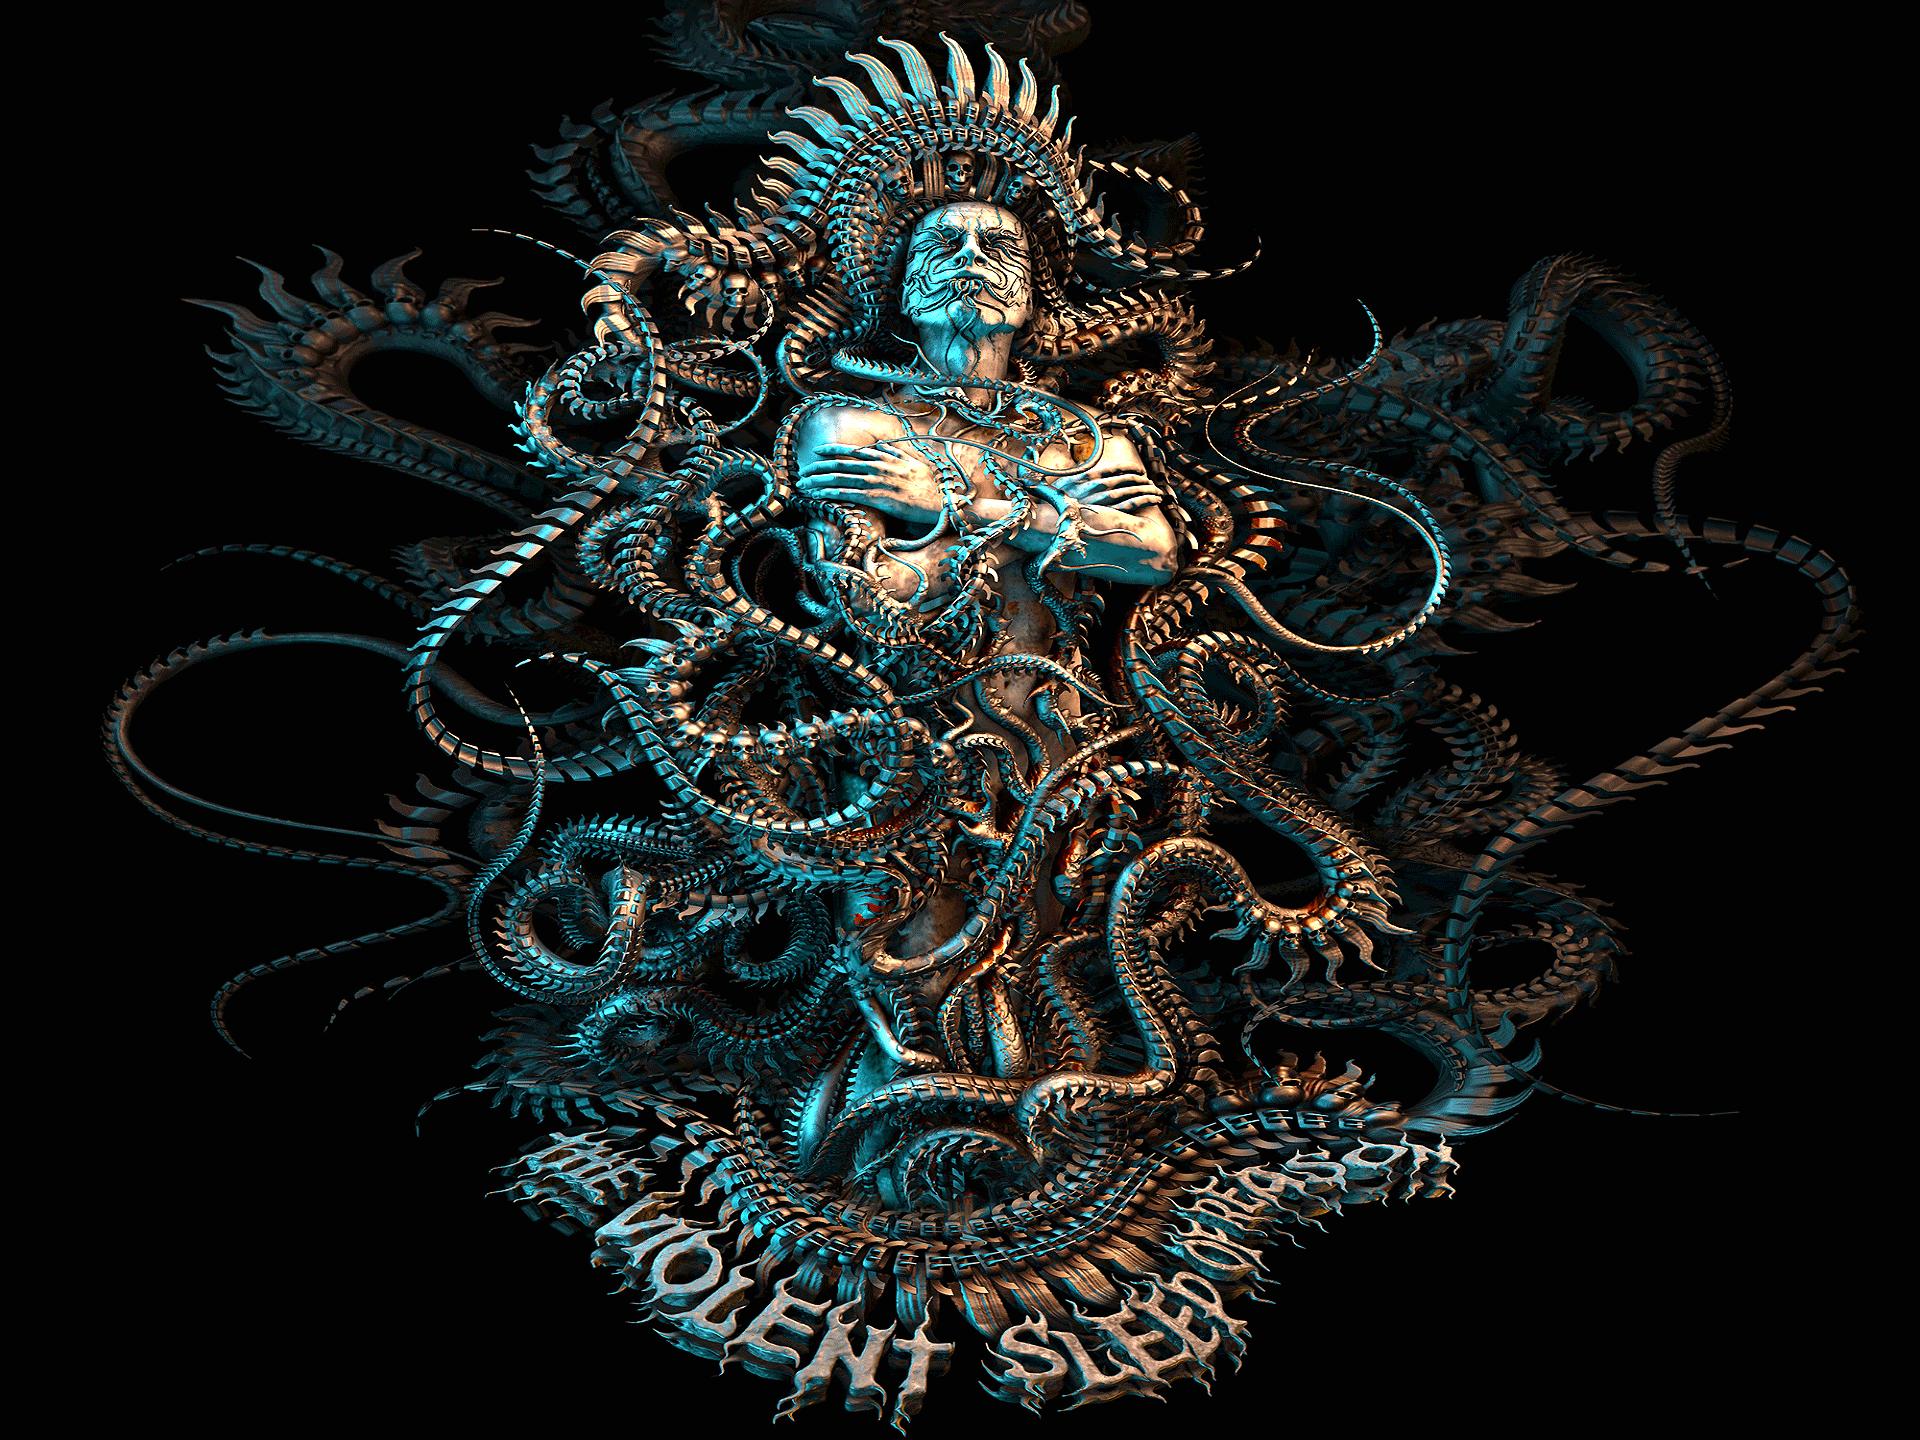 Meshuggah Hd Wallpaper Background Image 1920x1440 Id